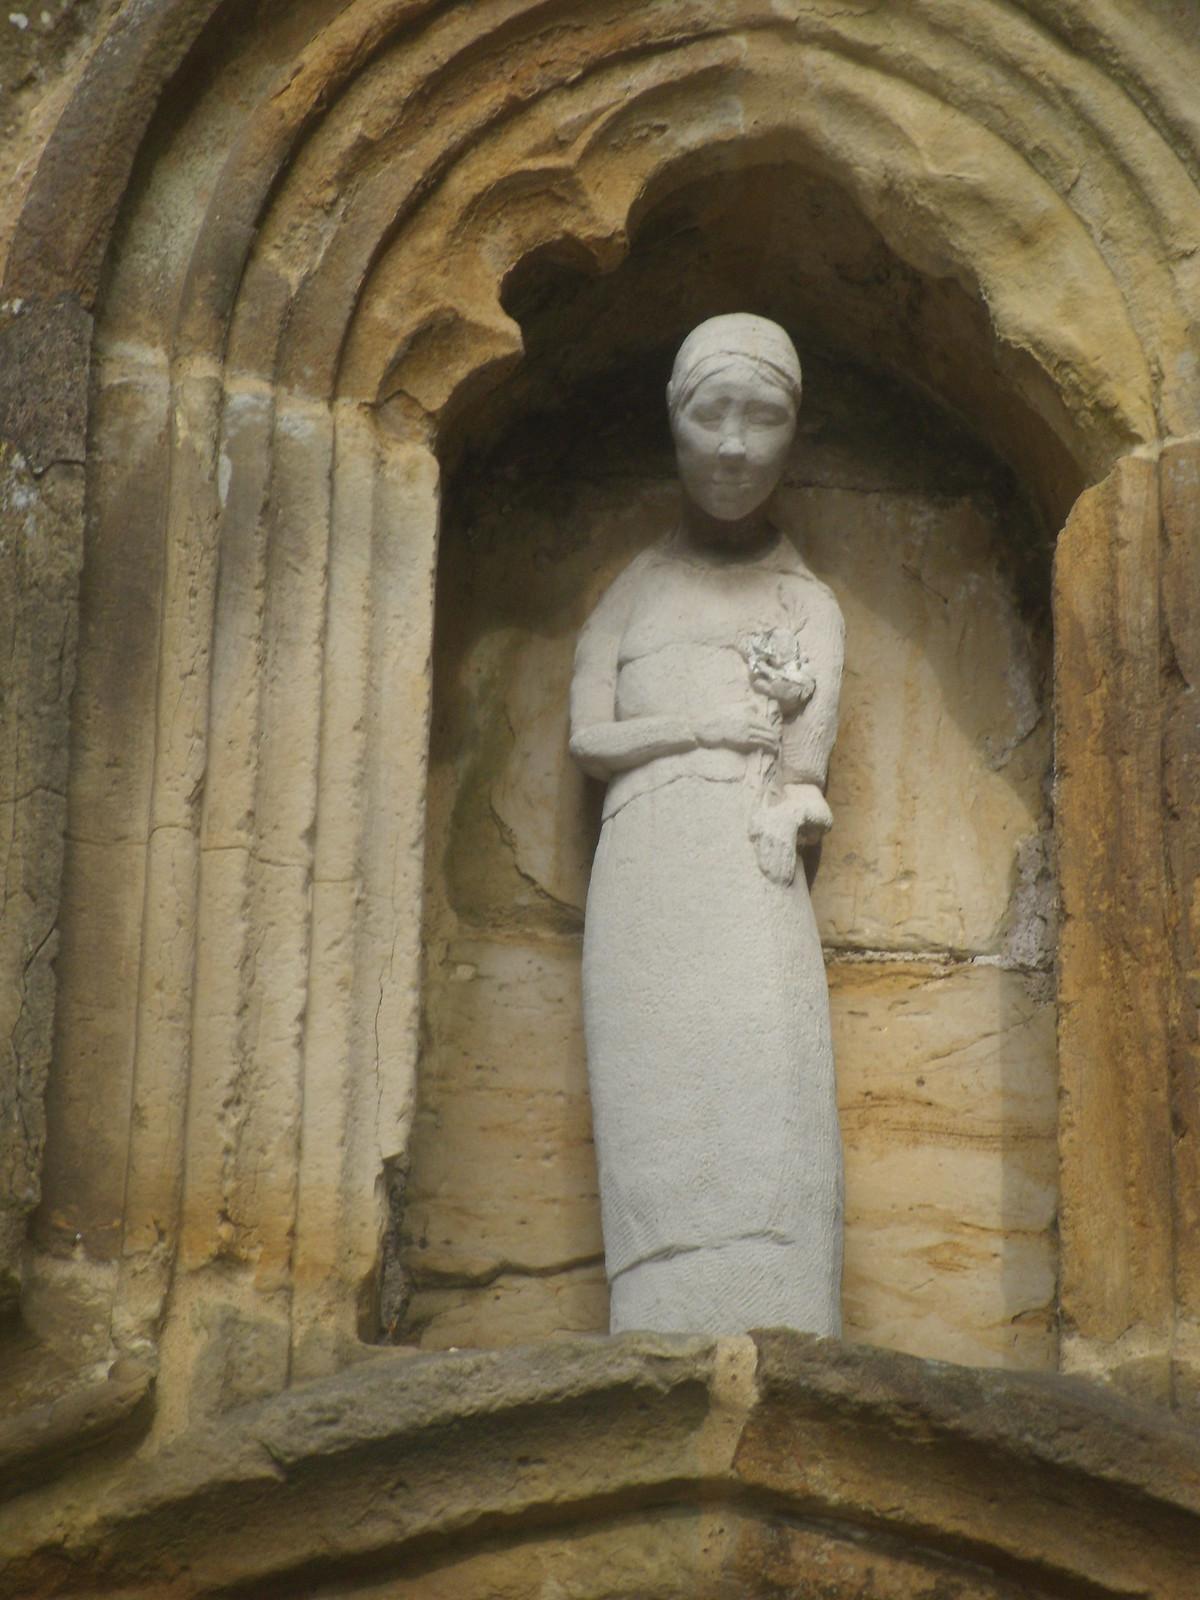 Virgin Mary Modern statue. Saleham Church. Robertsbridge circular